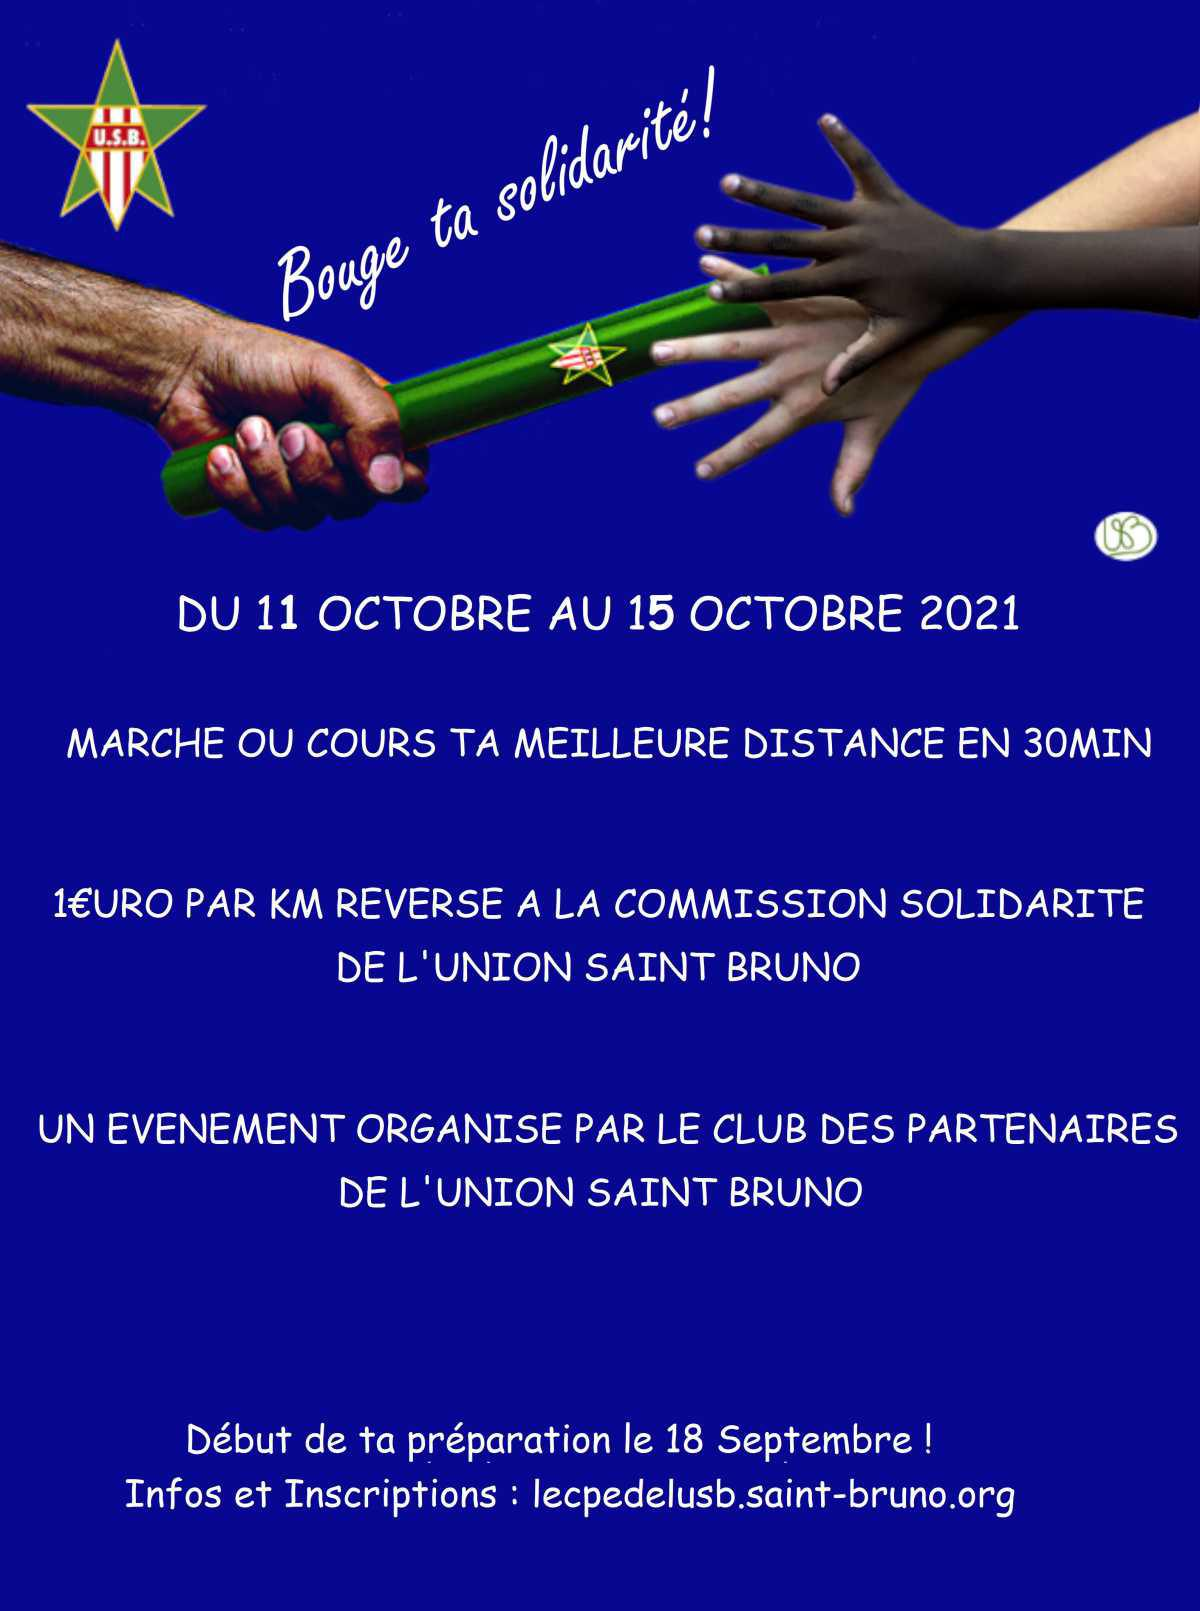 Bouge Ta Solidarité!